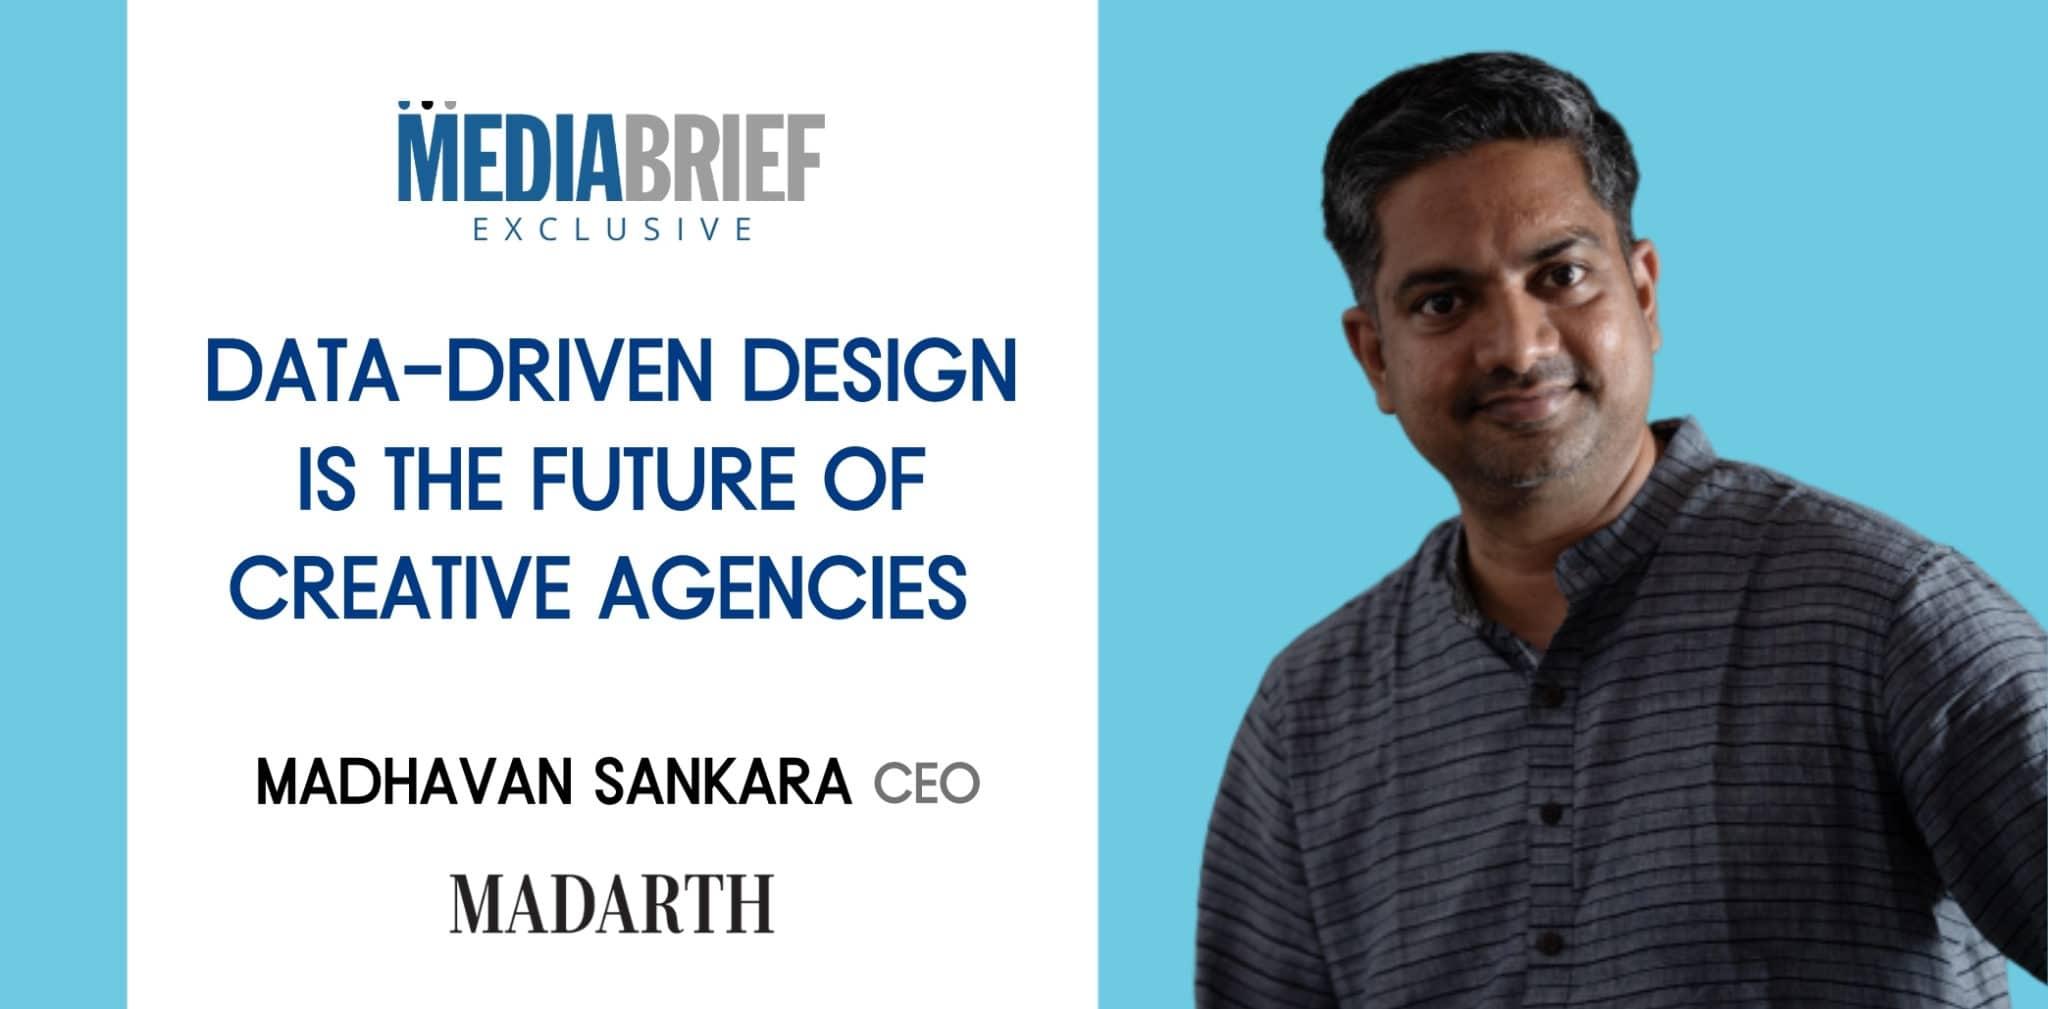 image-Exclusive-Madhavan-Sankara-CEO-Madarth-quote-2-mediabrief-4-scaled.jpg